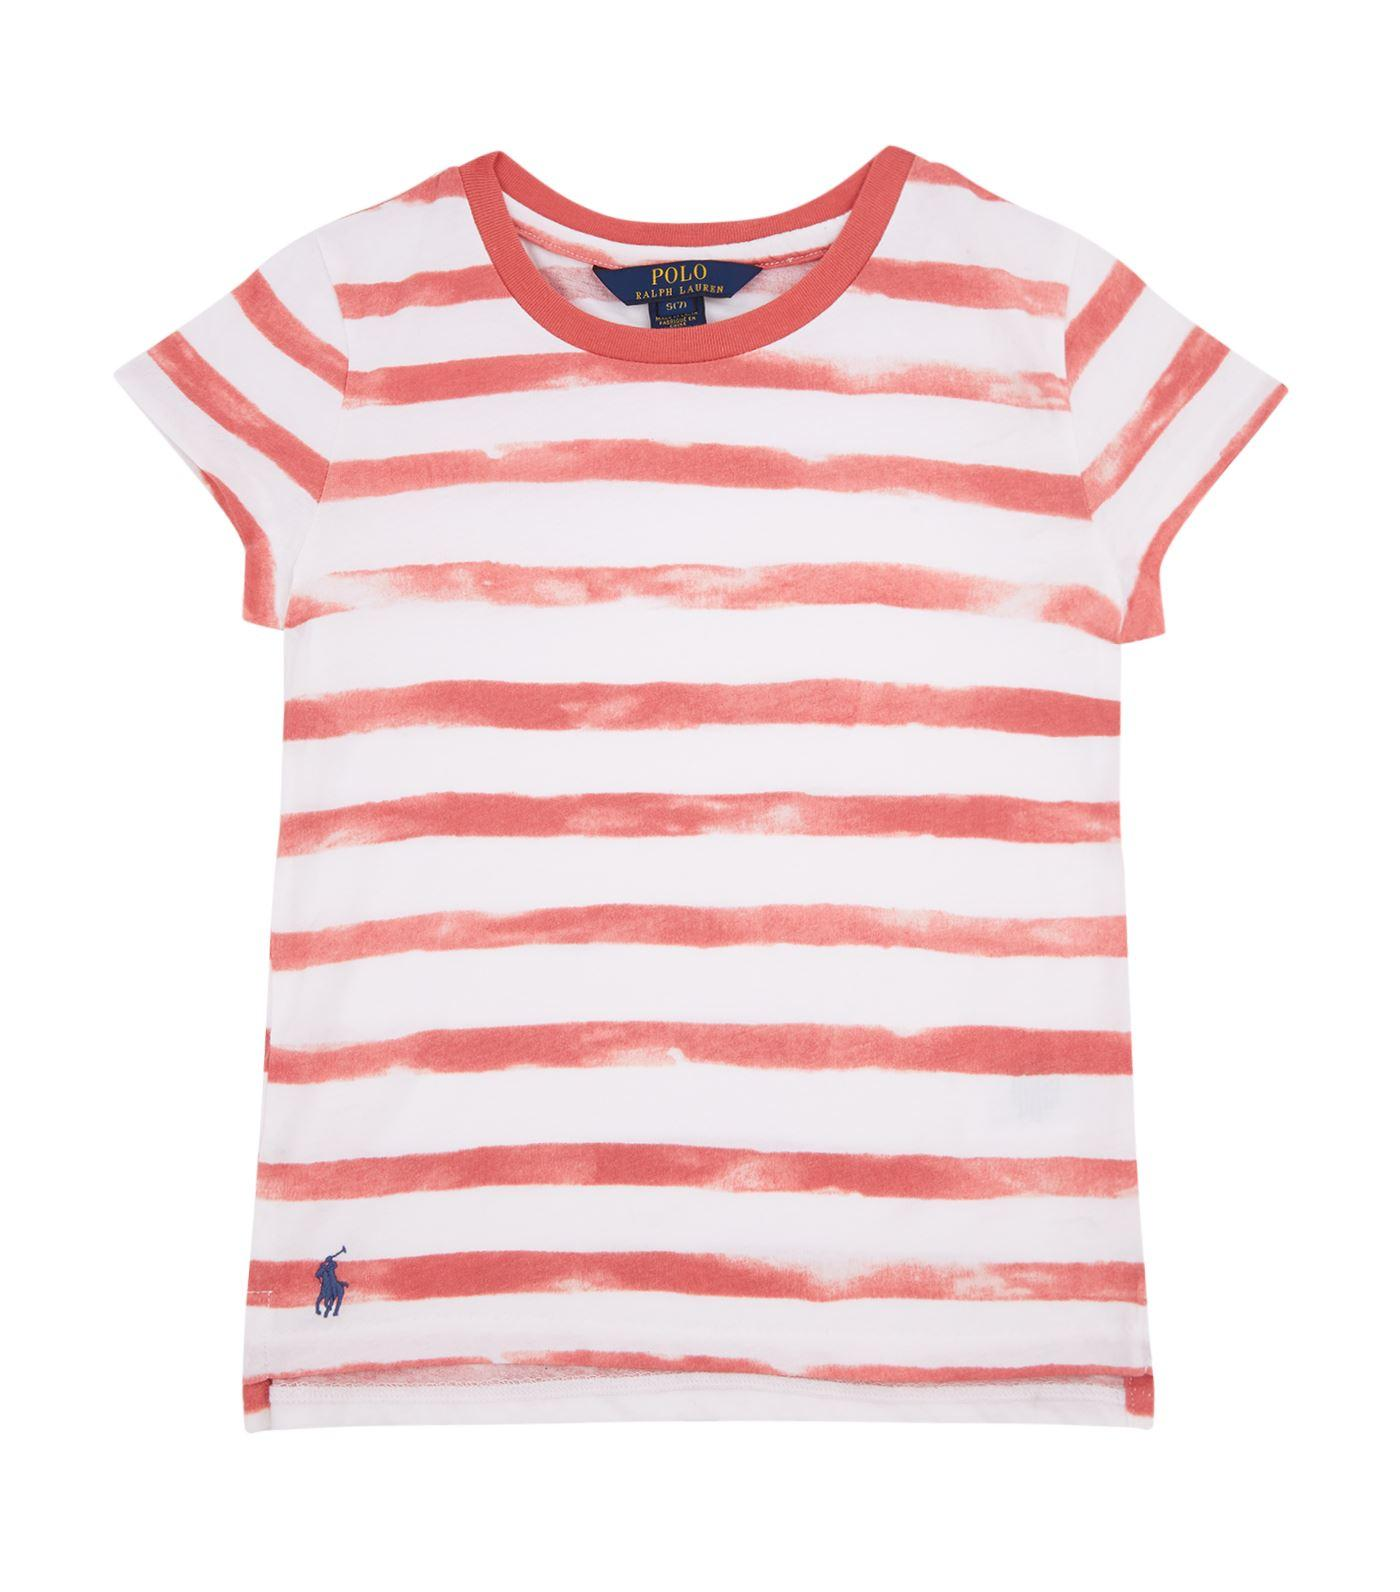 Ralph Lauren Washed Stripe T-shirt In Red